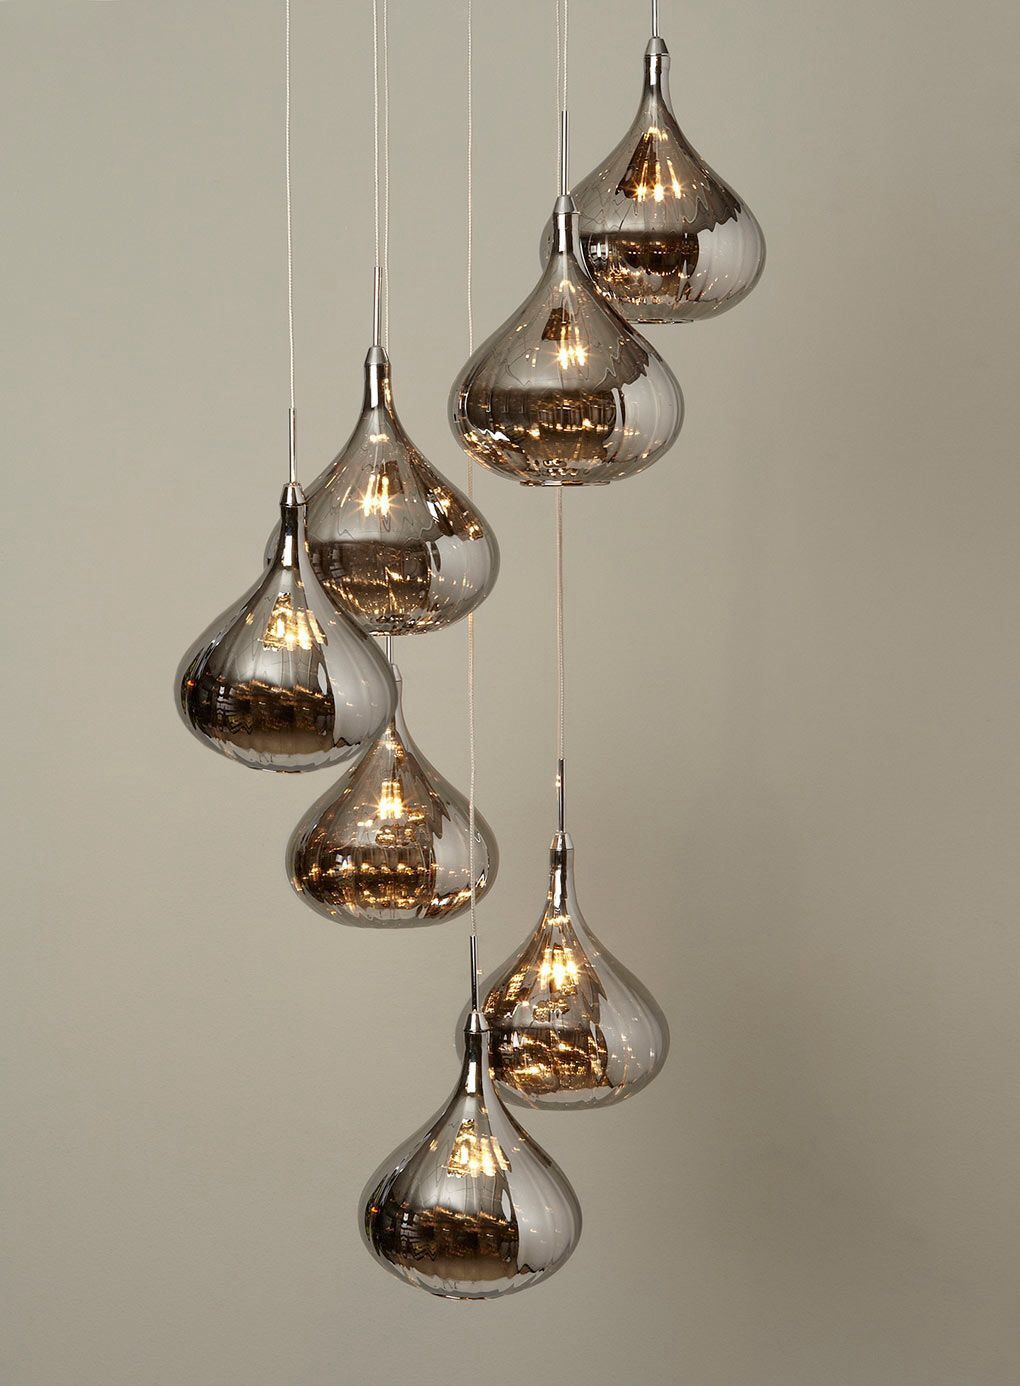 Teardrop Light Pendants Hanging Lamp Design Cluster Pendant Lighting Crystal Pendant Lighting